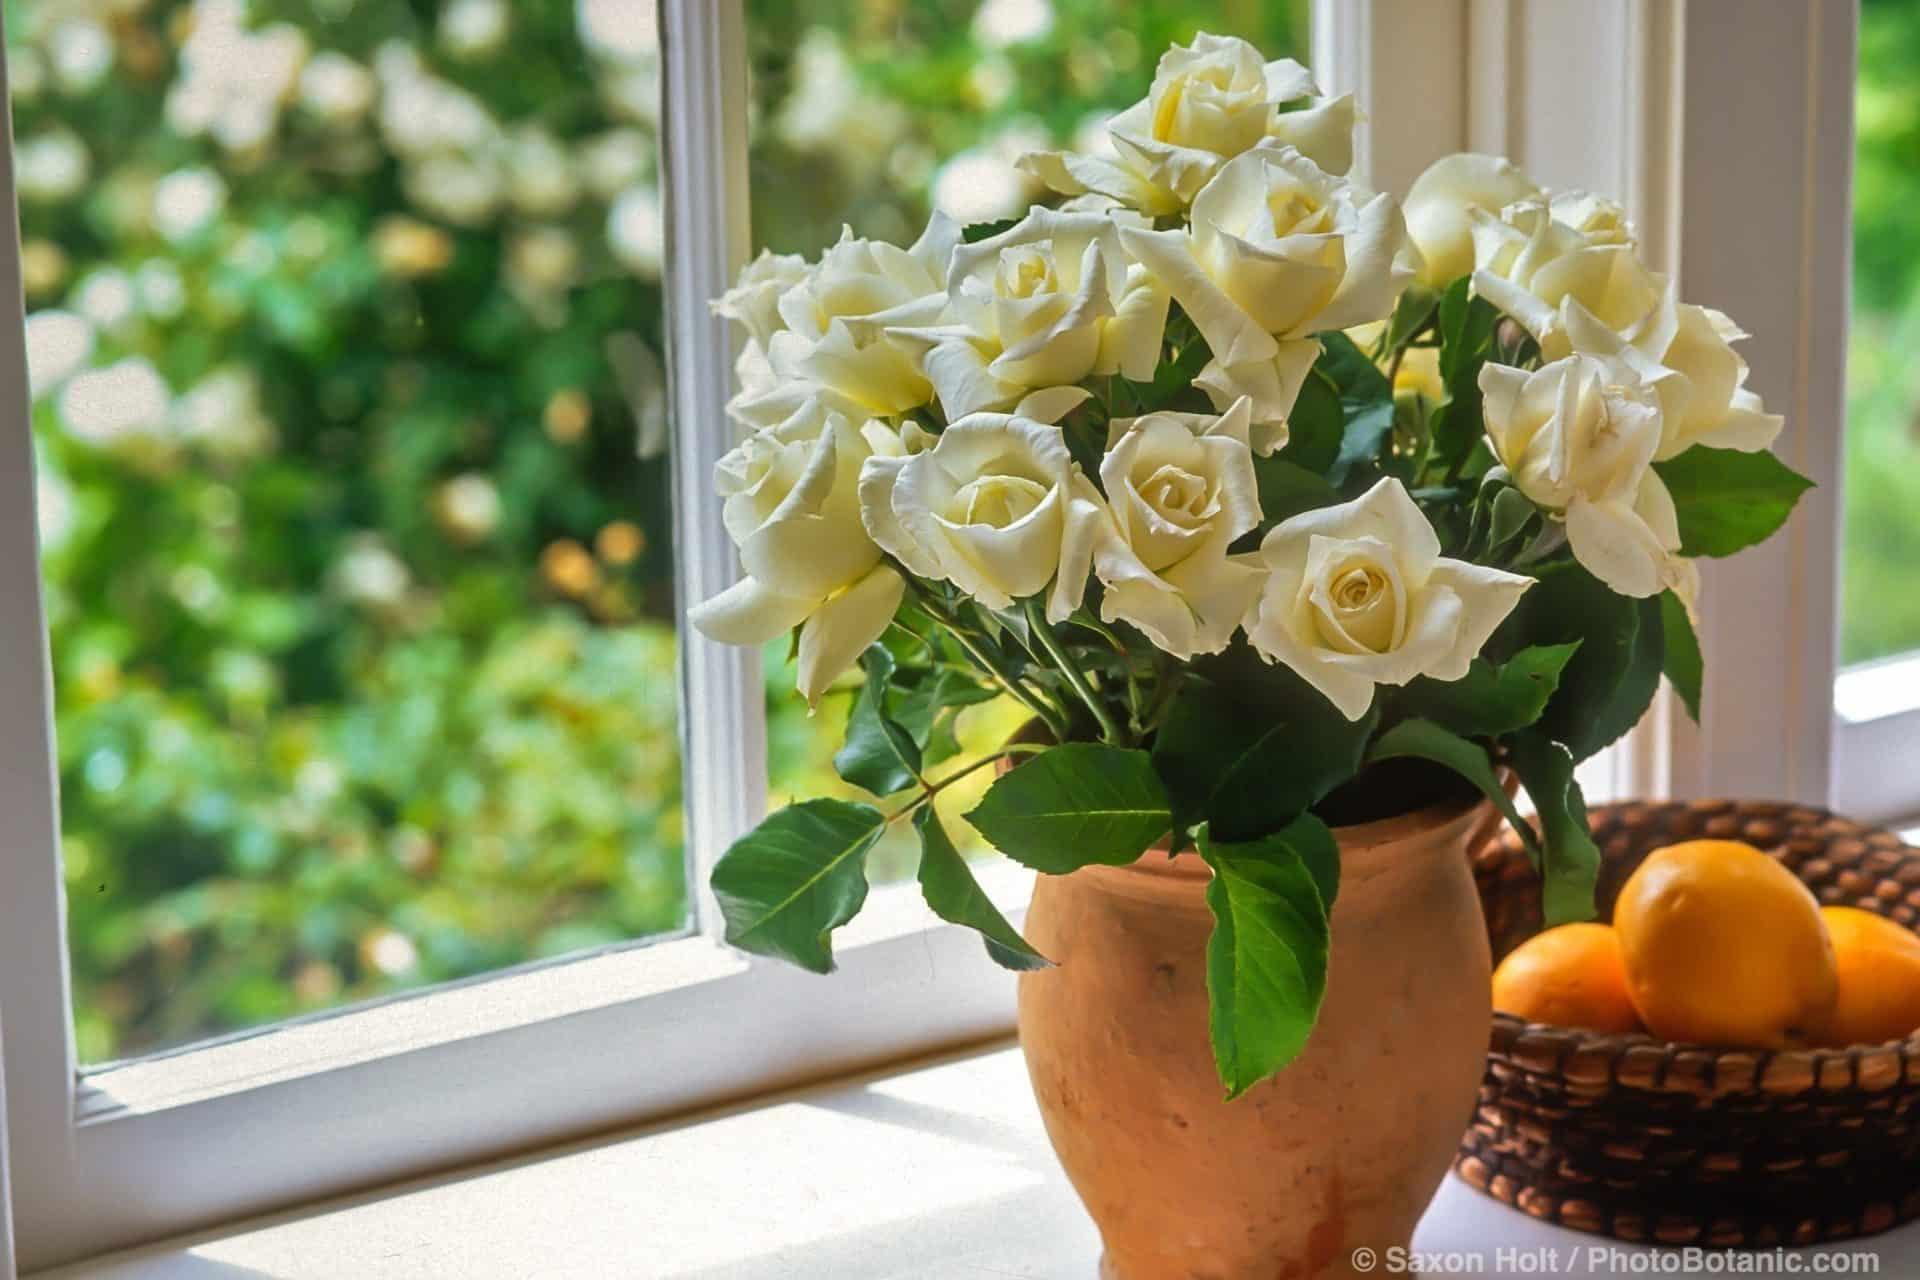 Bouquet of white rose 'Pascali' on windowsill